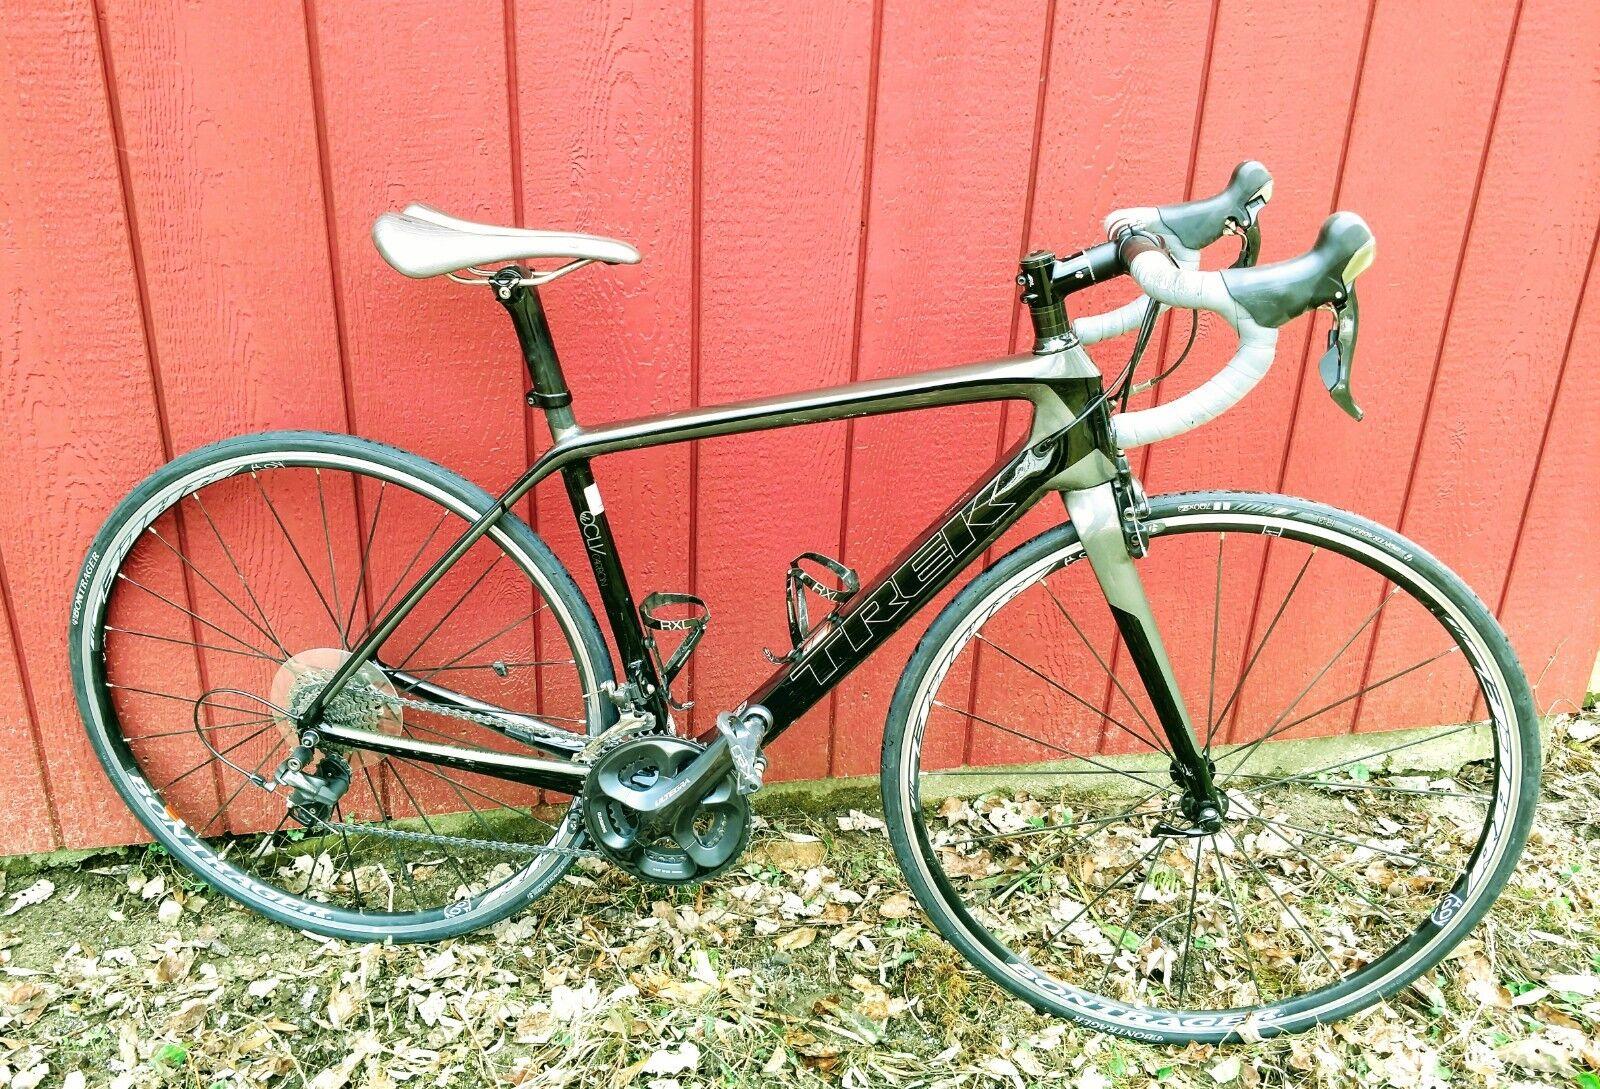 594a111255f Find Trek Mountain Bikes for sale